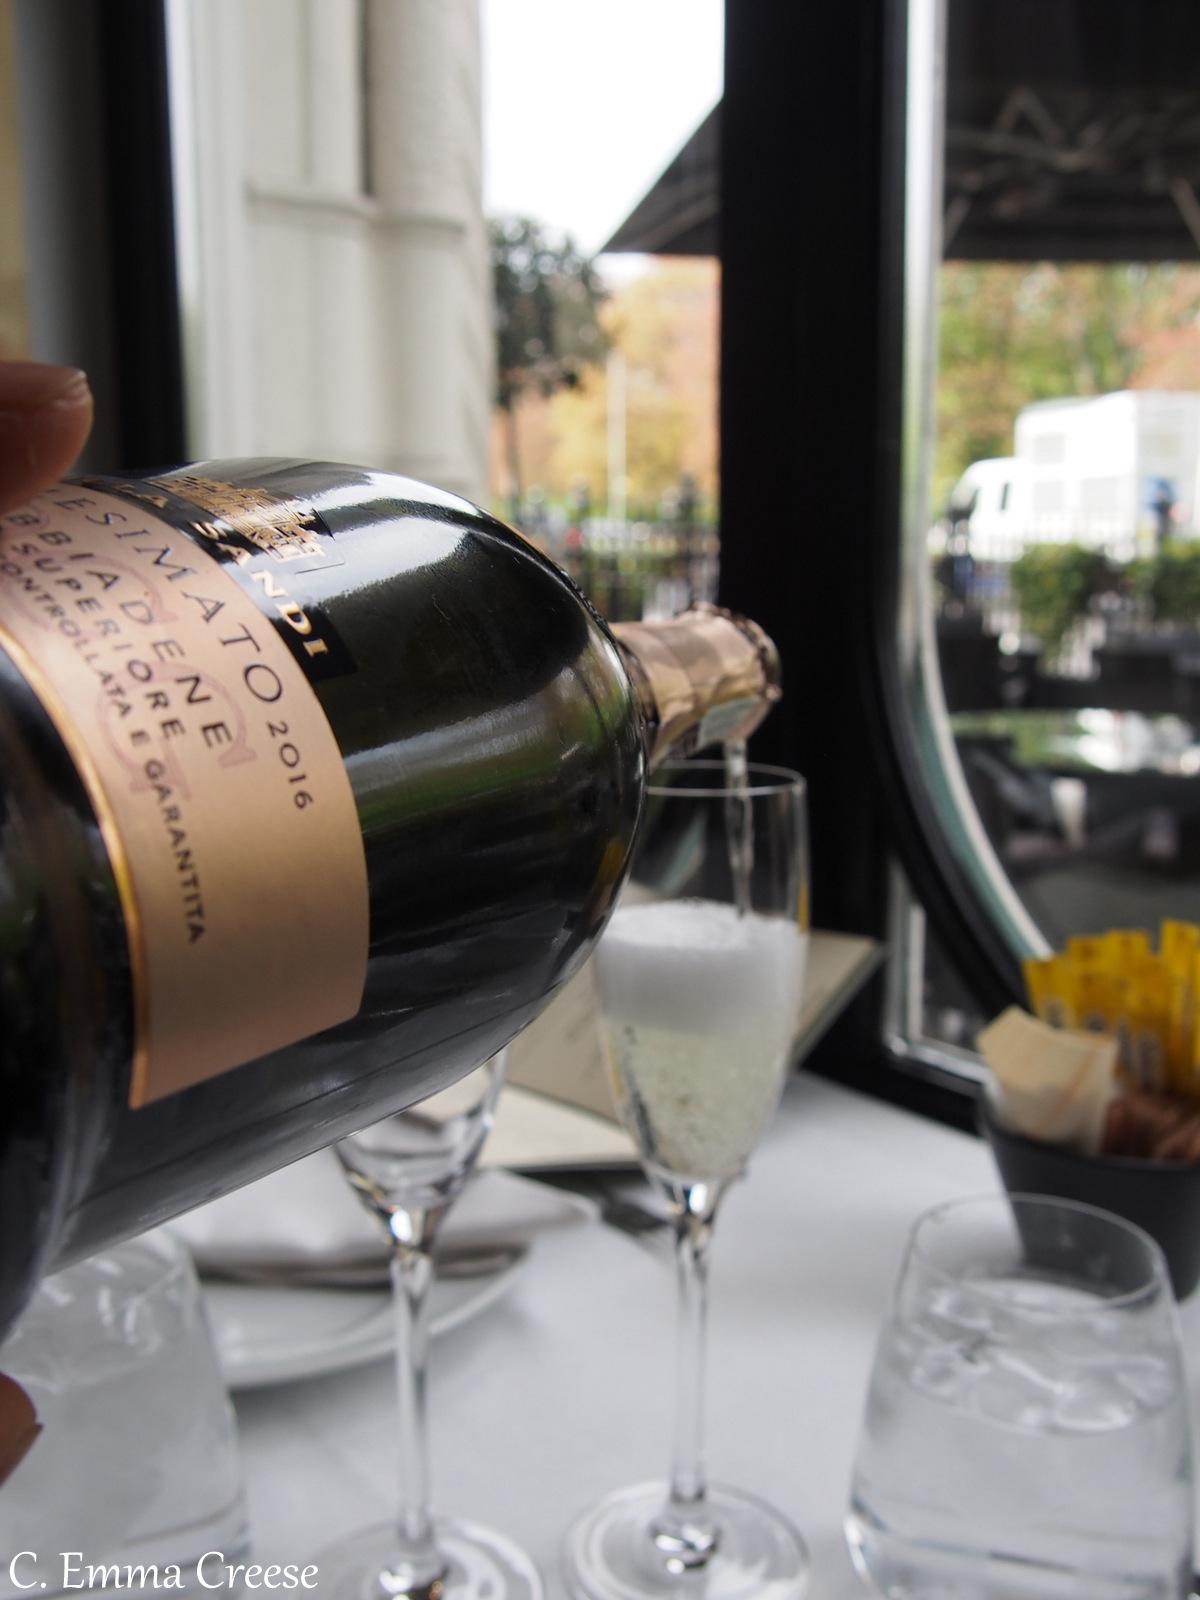 Luxury Afternoon Tea Baglioni Hotel Adventures of a London Kiwi